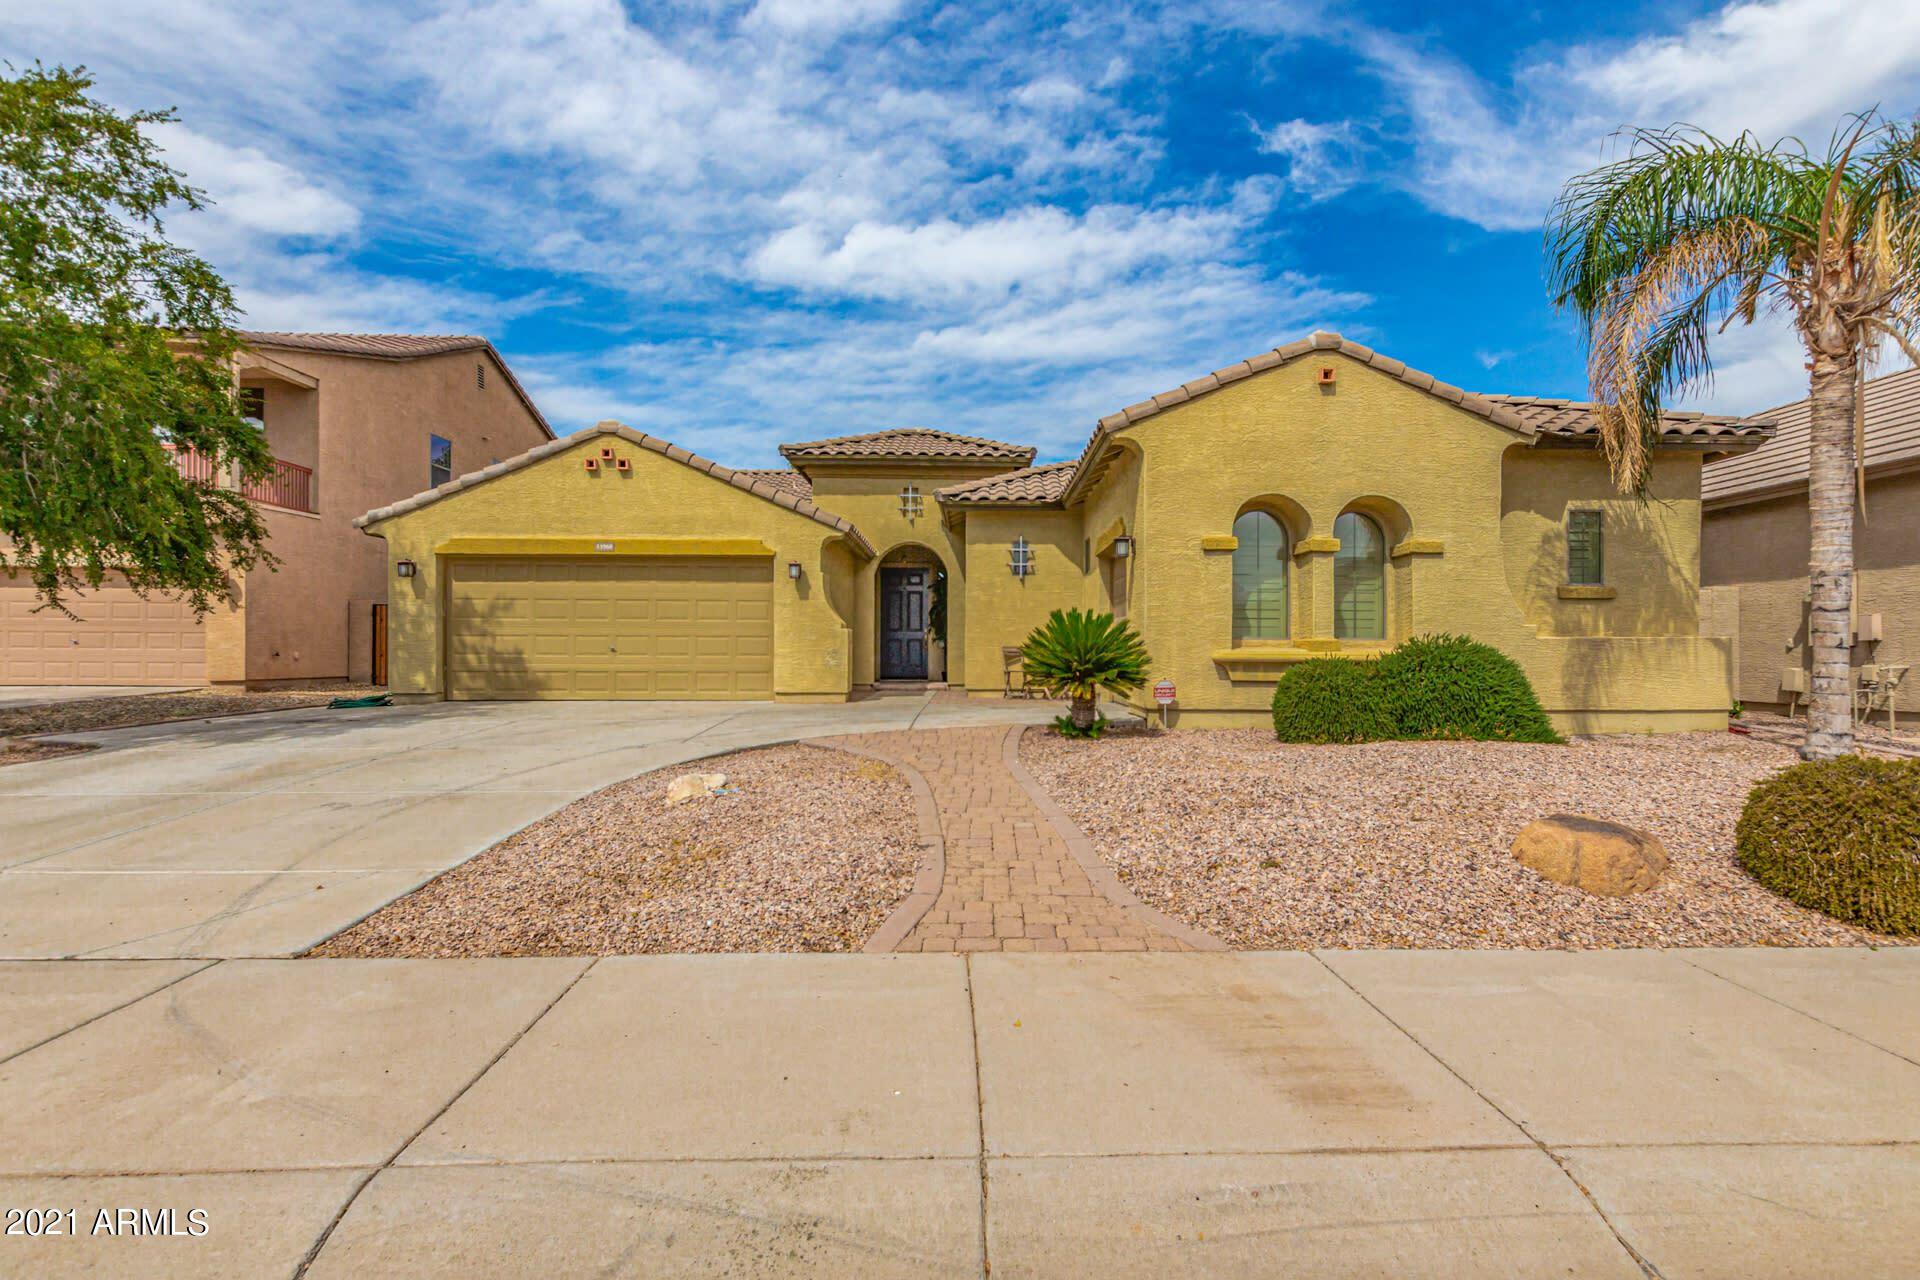 11960 W JESSIE Lane, Sun City, AZ 85373 - MLS#: 6298853